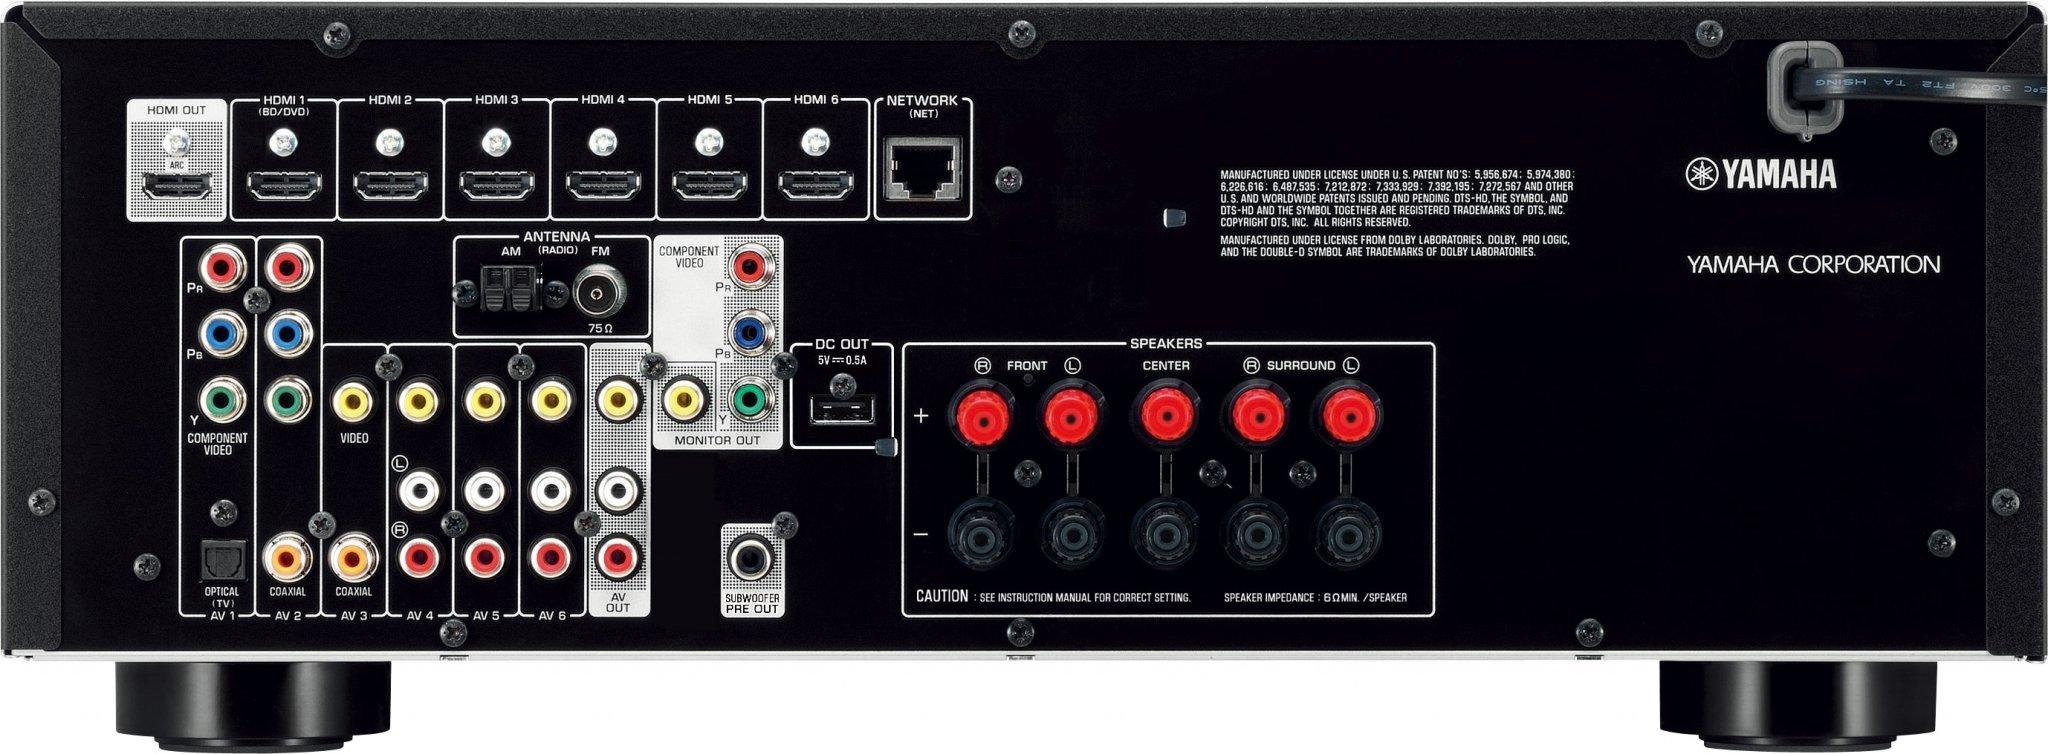 Her er yamaha 39 s 2014 surround receivere digitalt tv for Yamaha remote control app